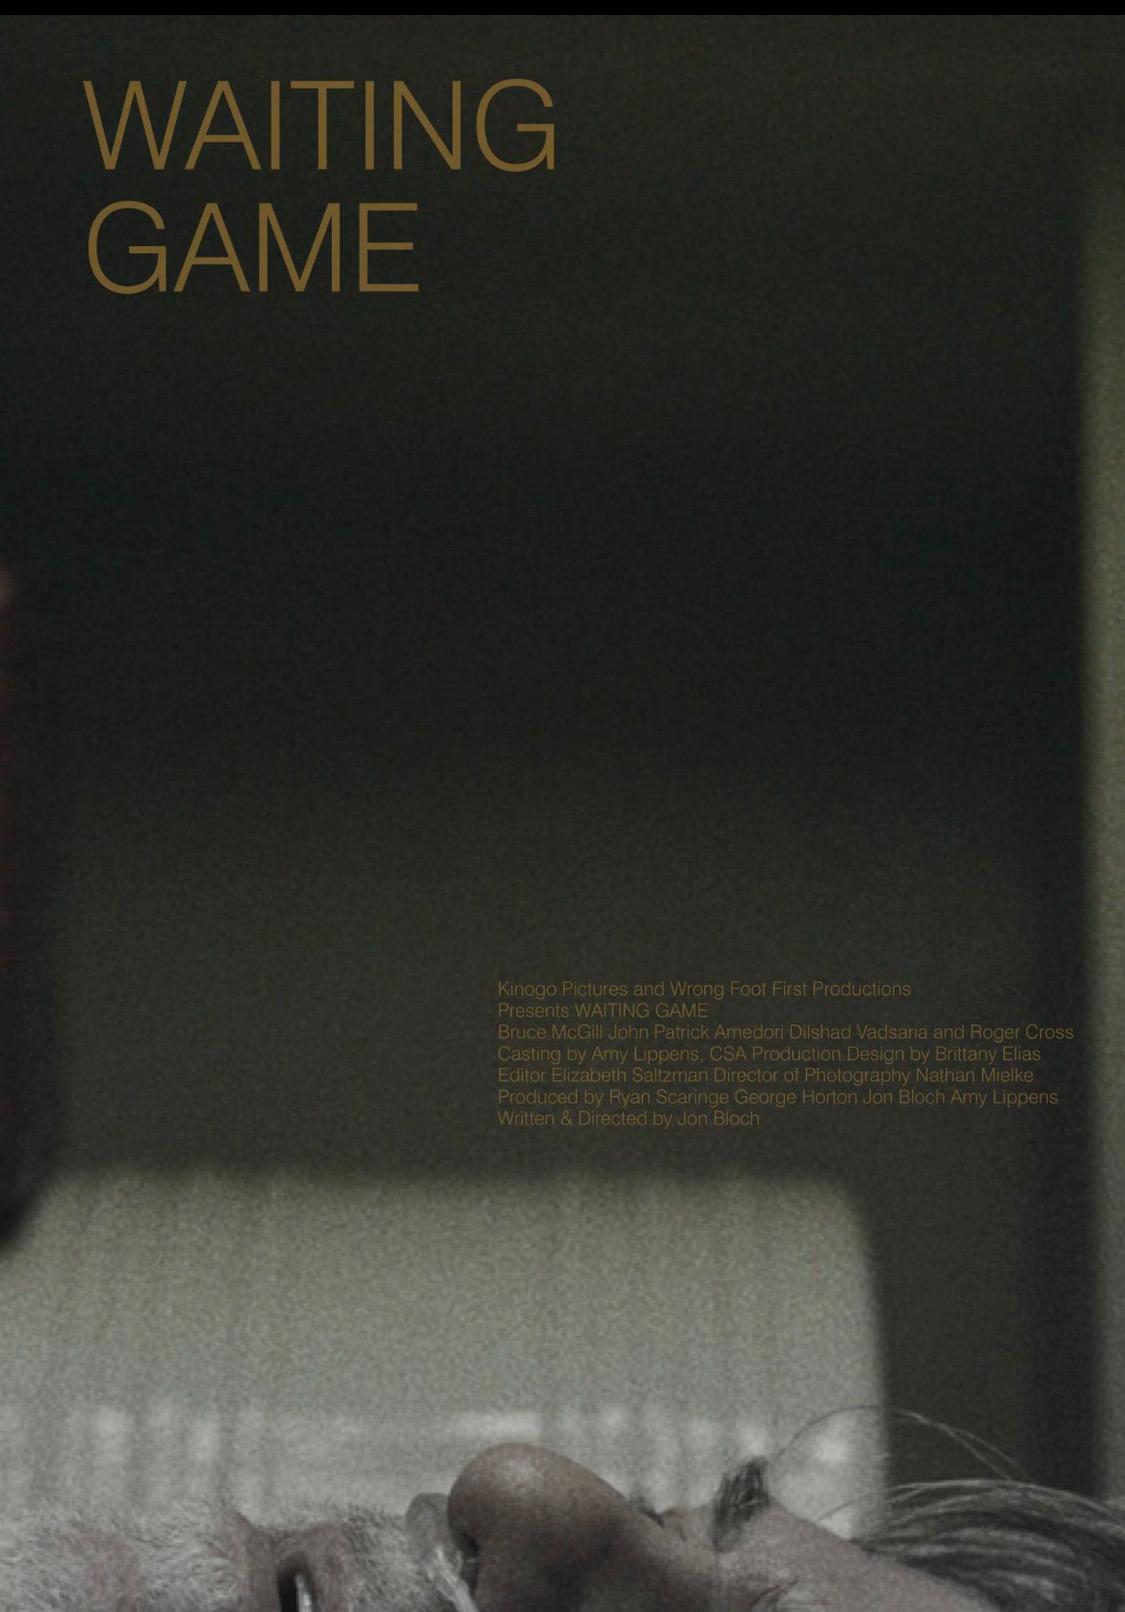 """Waiting Game"" screens at the Pasadena International Film Festival"